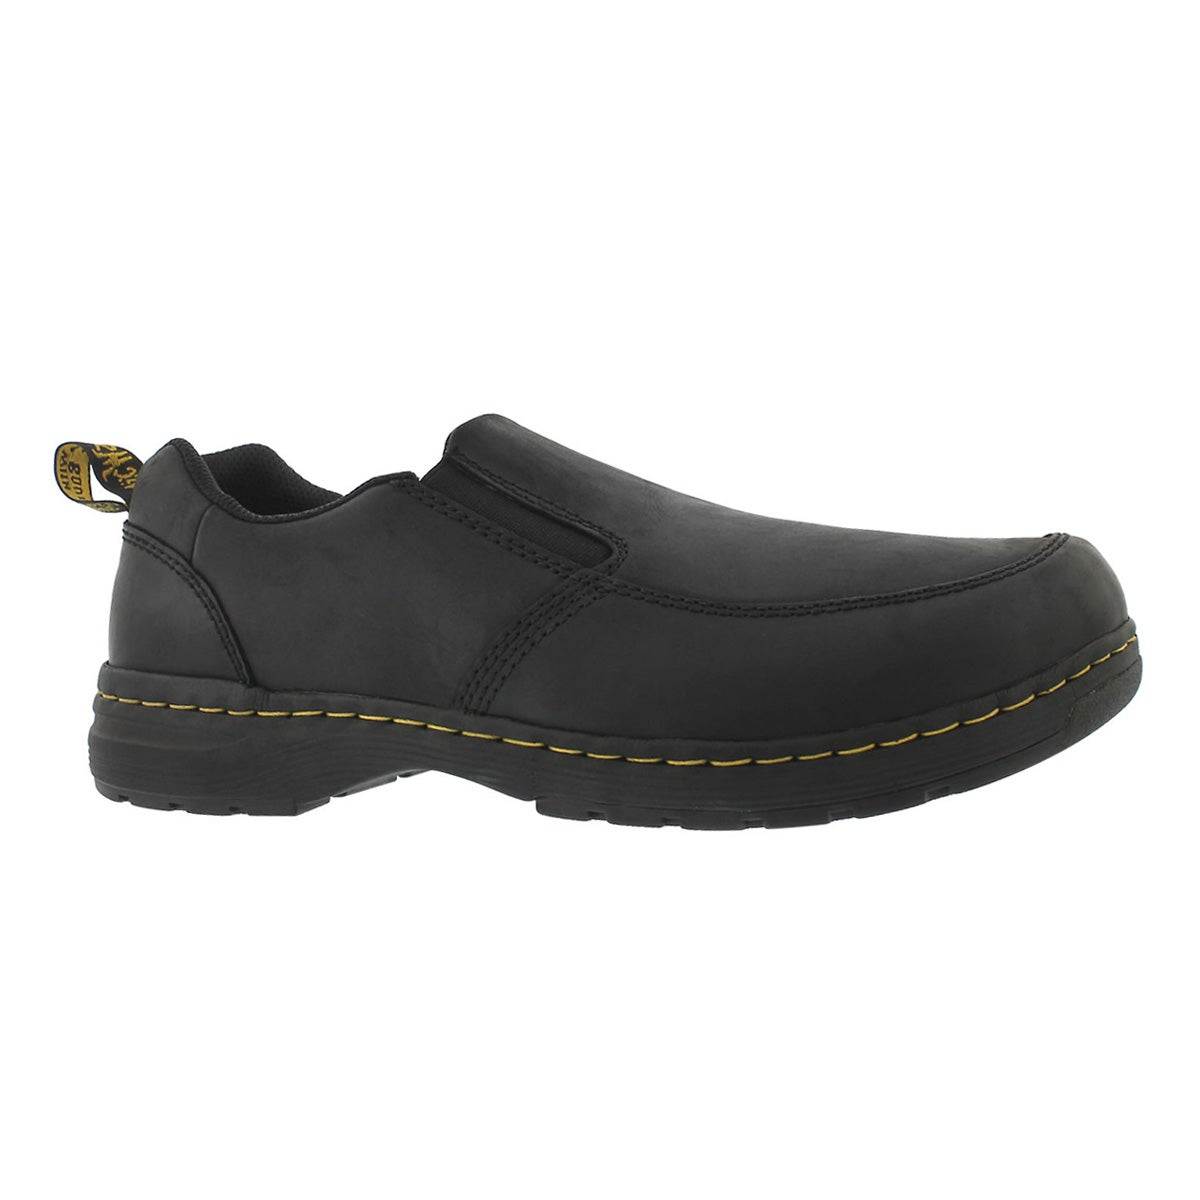 Men's BRENNAN black slip on casual shoe